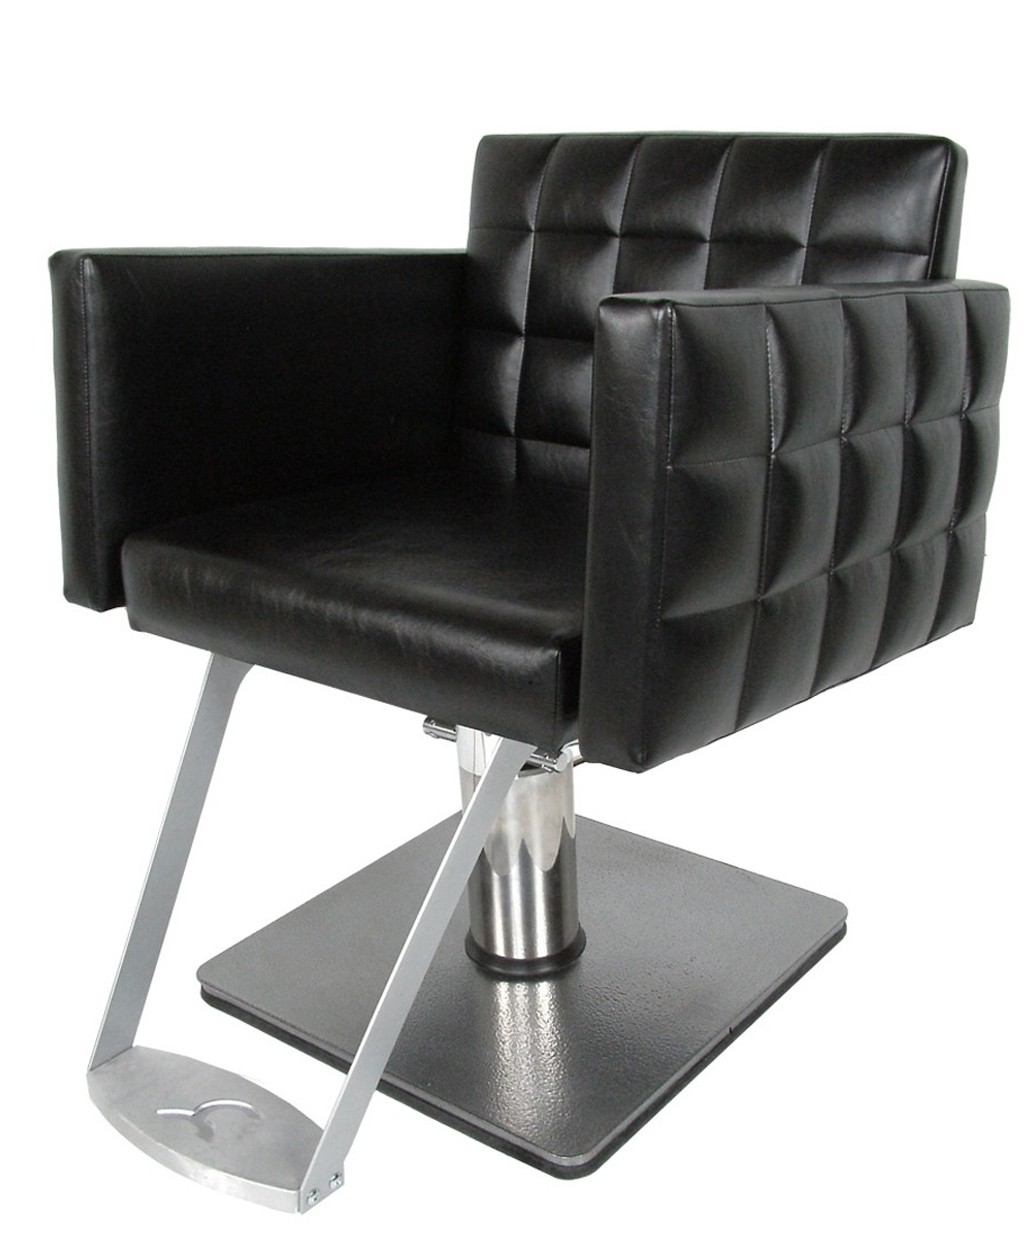 Collins 6800 Nouveau Styling Chair